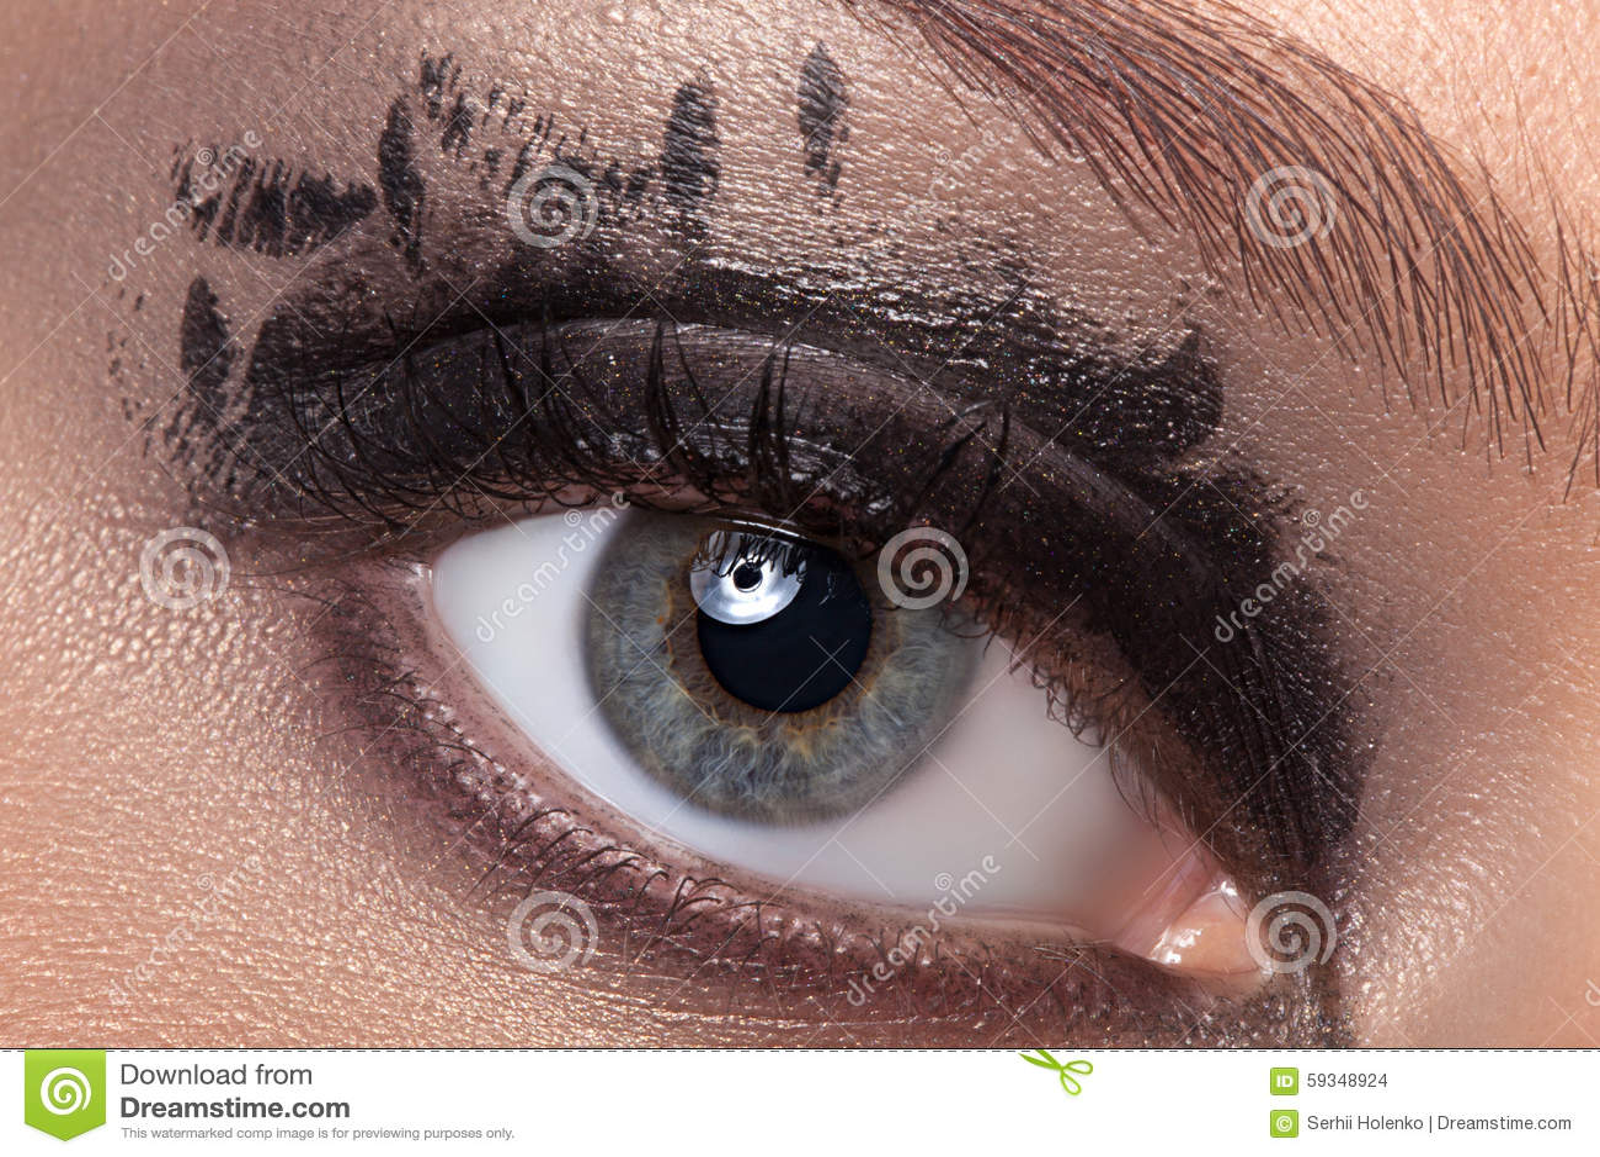 Black Eye Makeup Stock Photo Image Of Make Creative 59348924